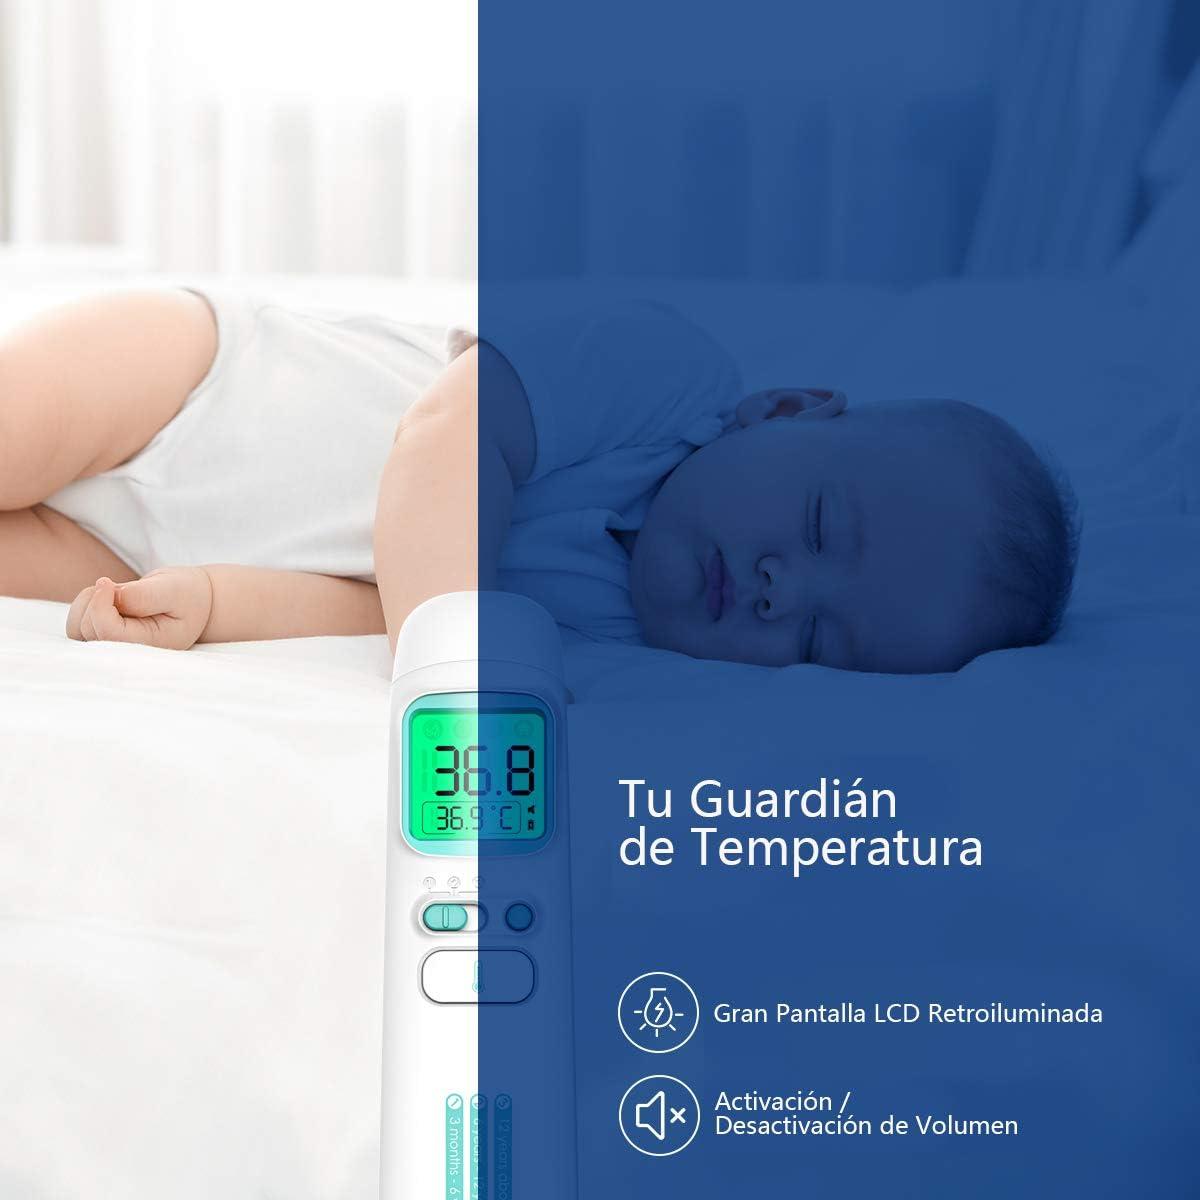 Pantalla LCD Digital Mazuer Term/ómetro de precisi/ón Profesional para ni/ños 5 Piezas ni/ños beb/és Adultos medidor de Temperatura de Fiebre